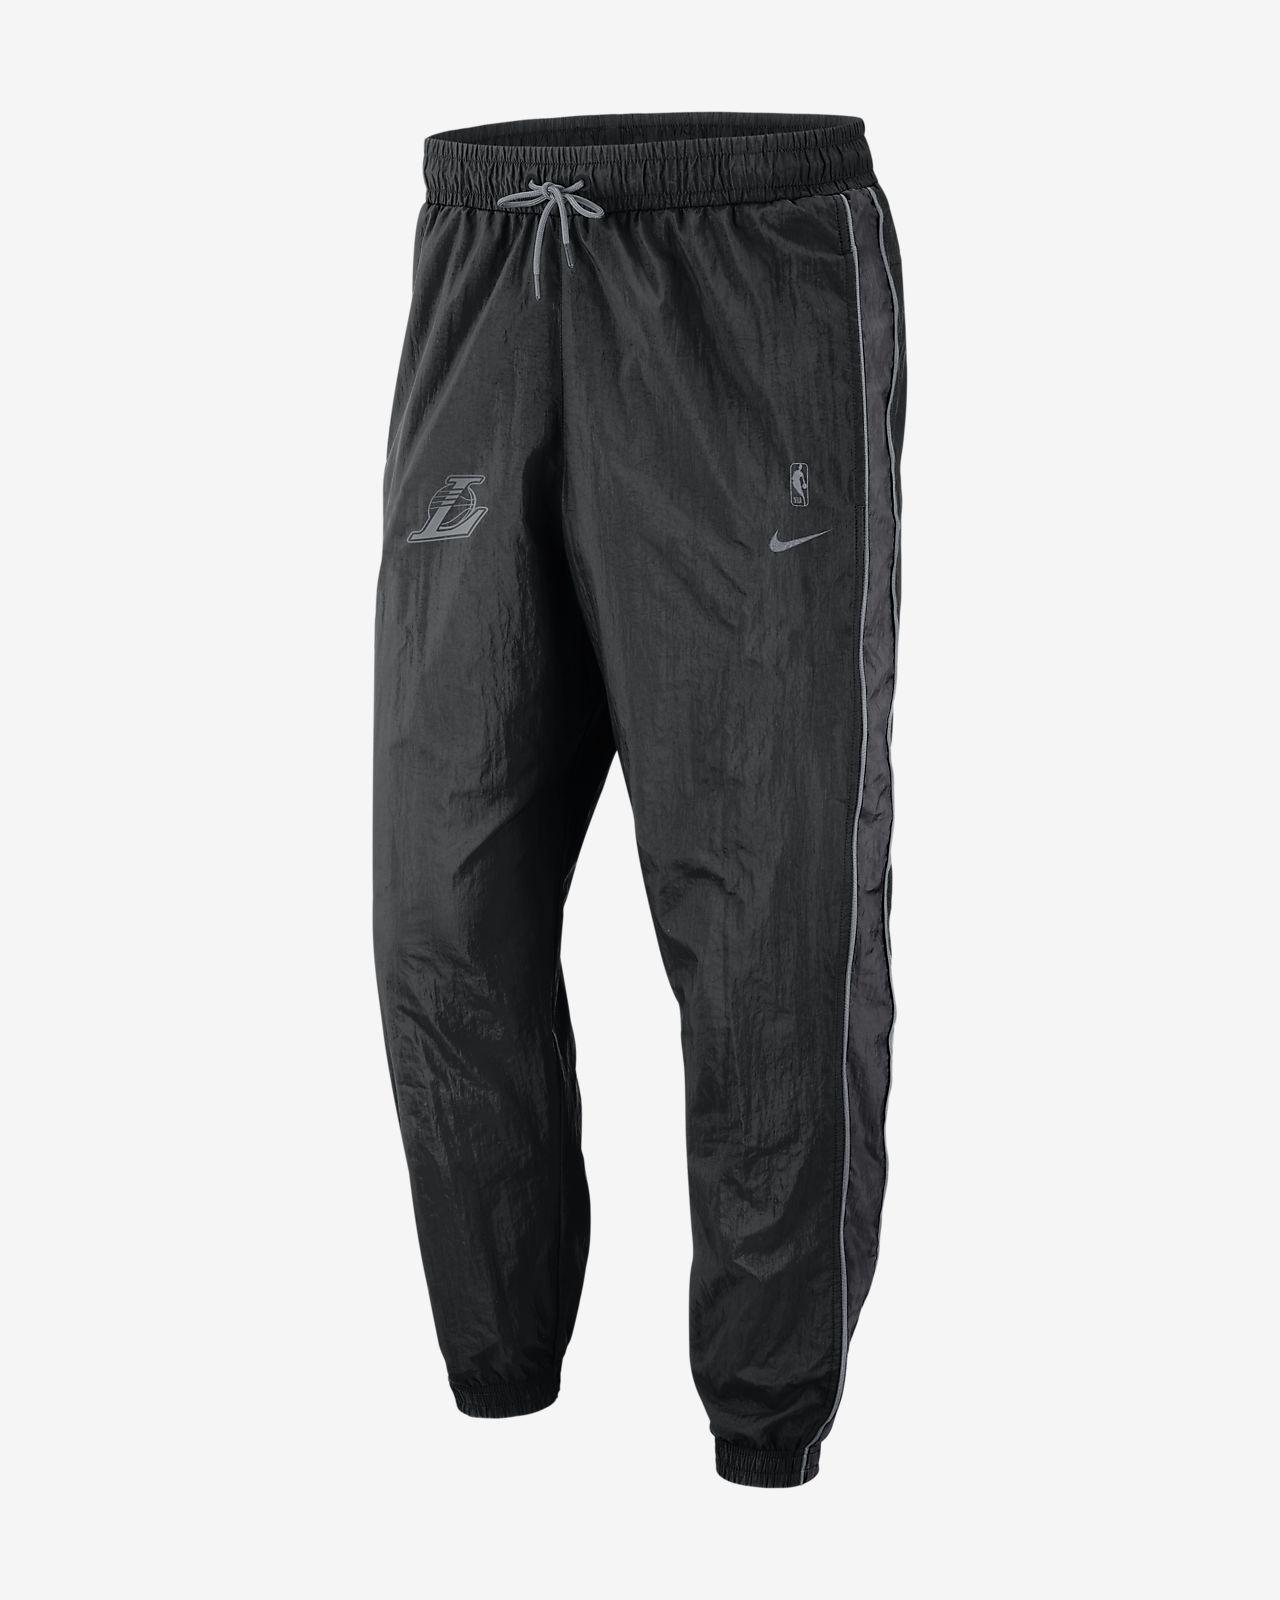 6ca3a0aa1e1f Los angeles lakers nike mens nba tracksuit pants jpg 1280x1600 Nike track  pants for boys